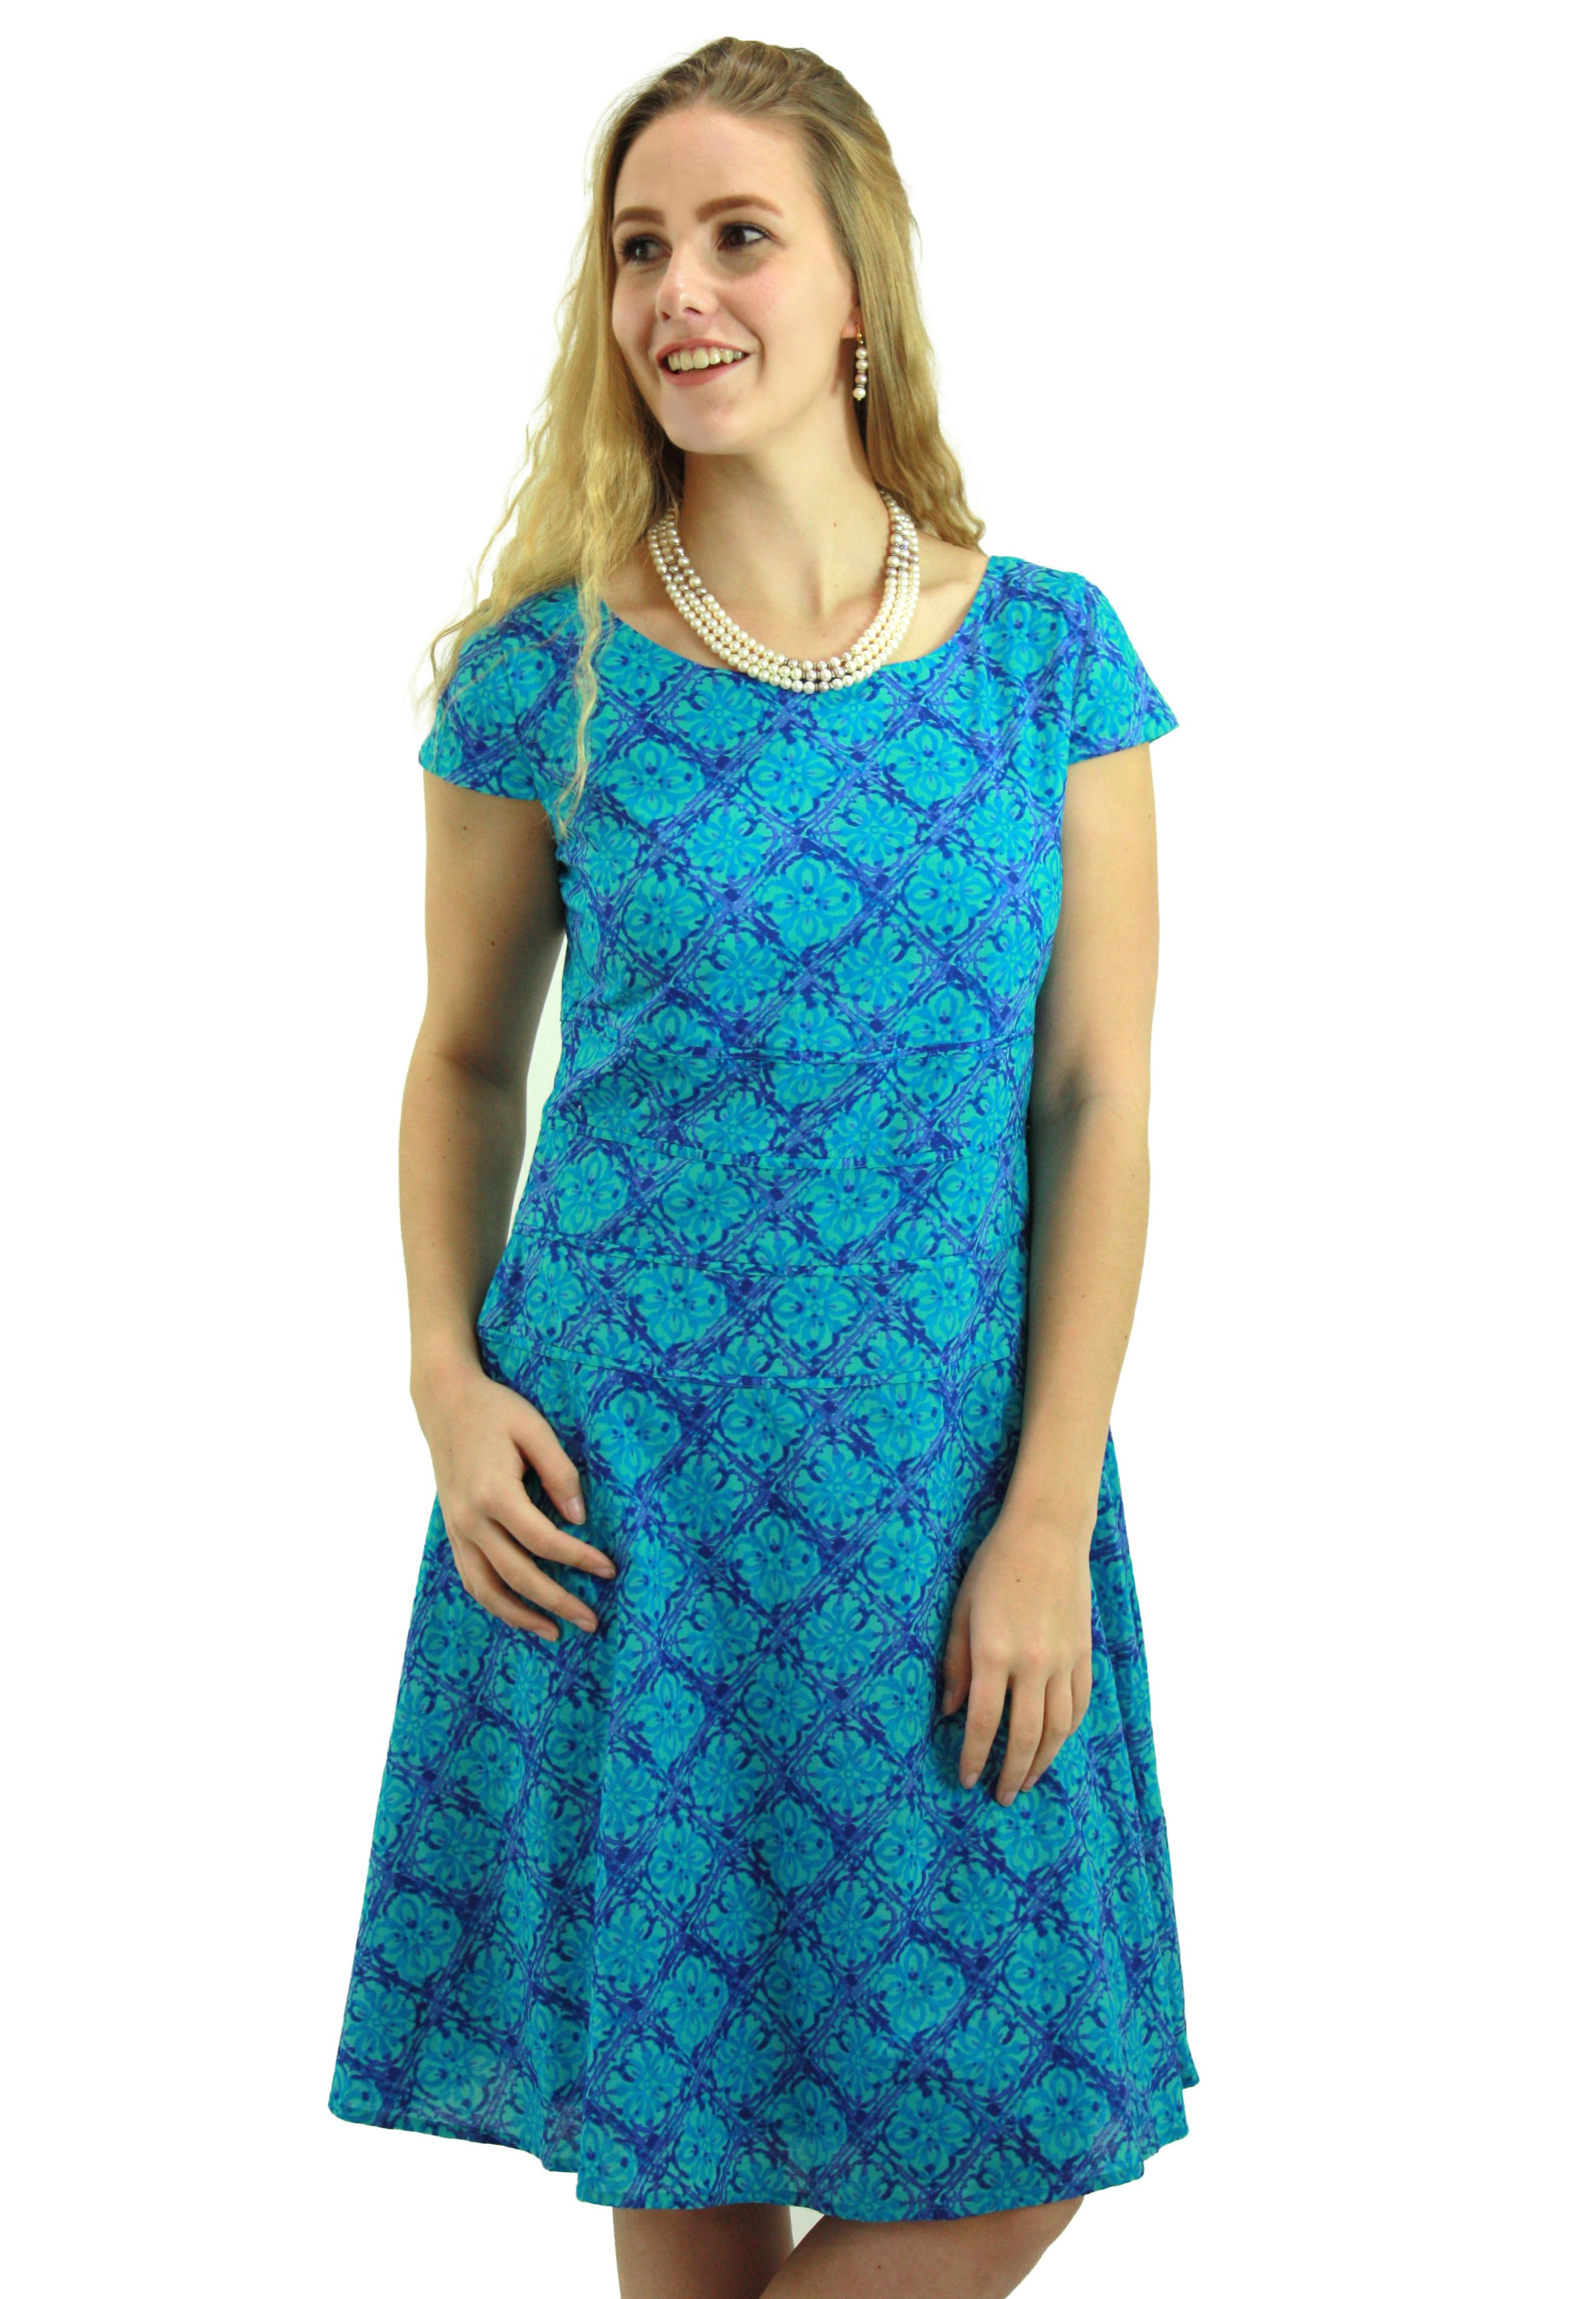 Turquoise Blue Tile Print Casual Dress DRHN015